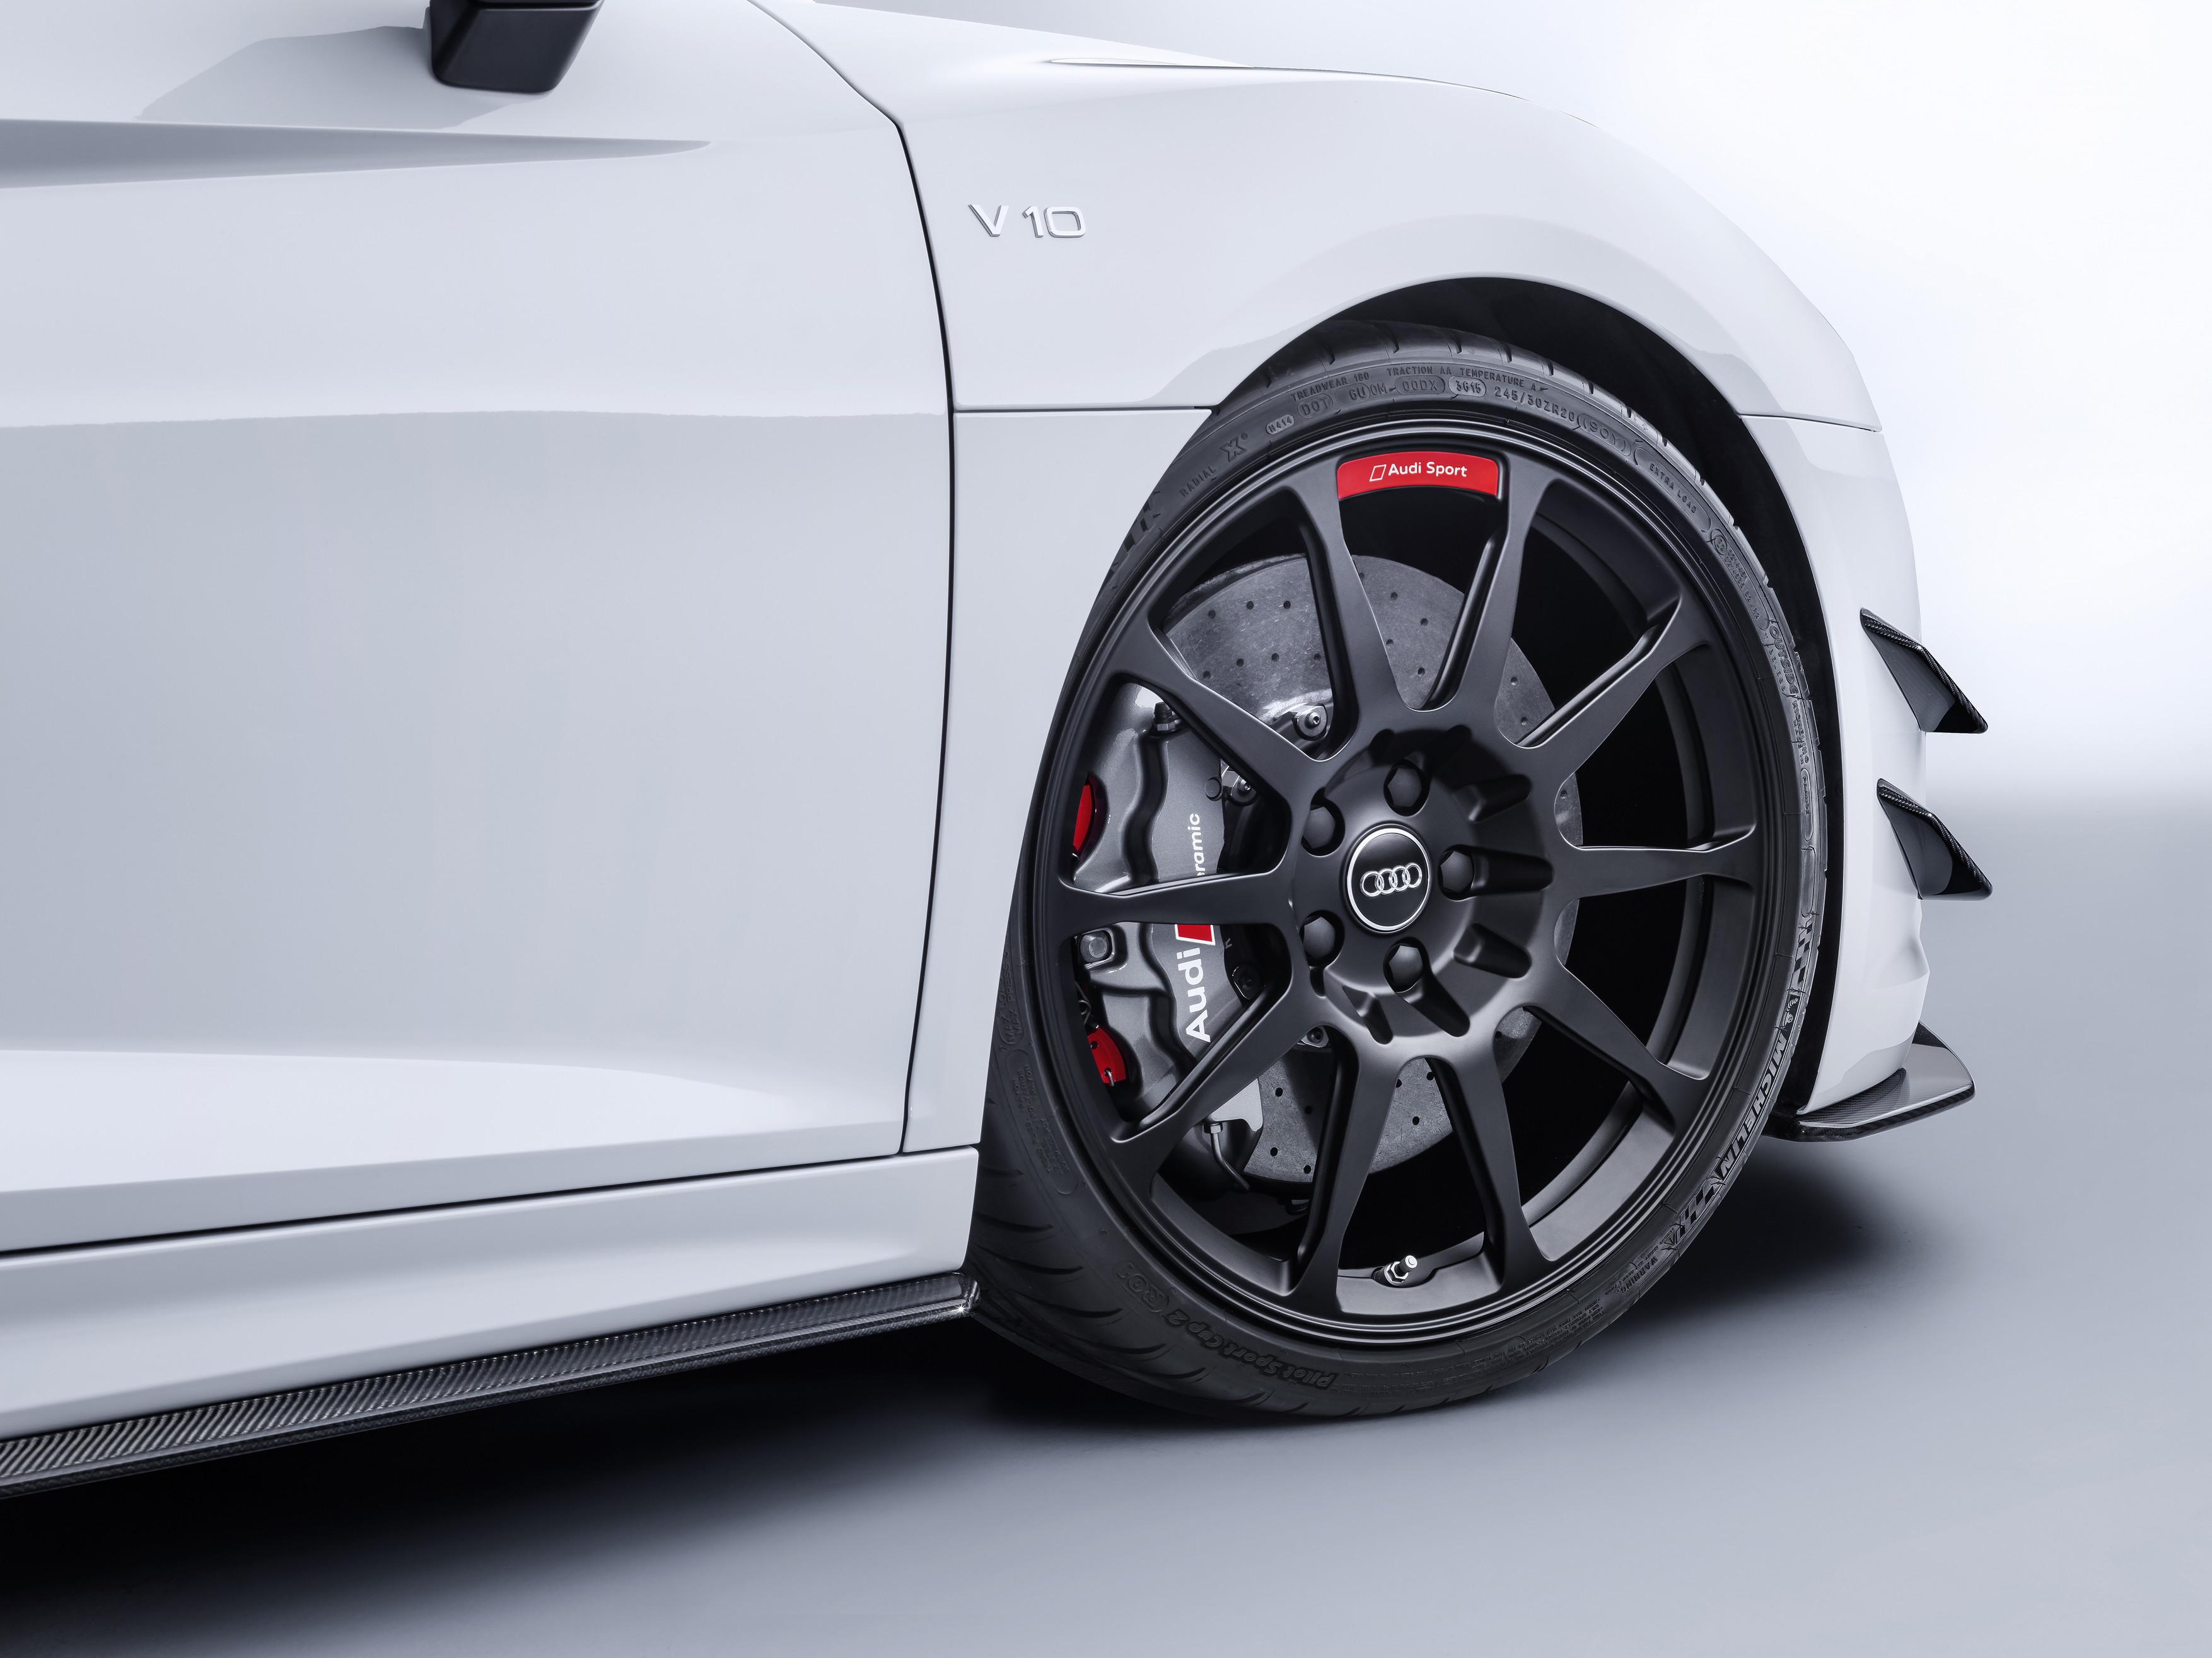 Audi-A5-Cabriolet-B9-test-mule-292